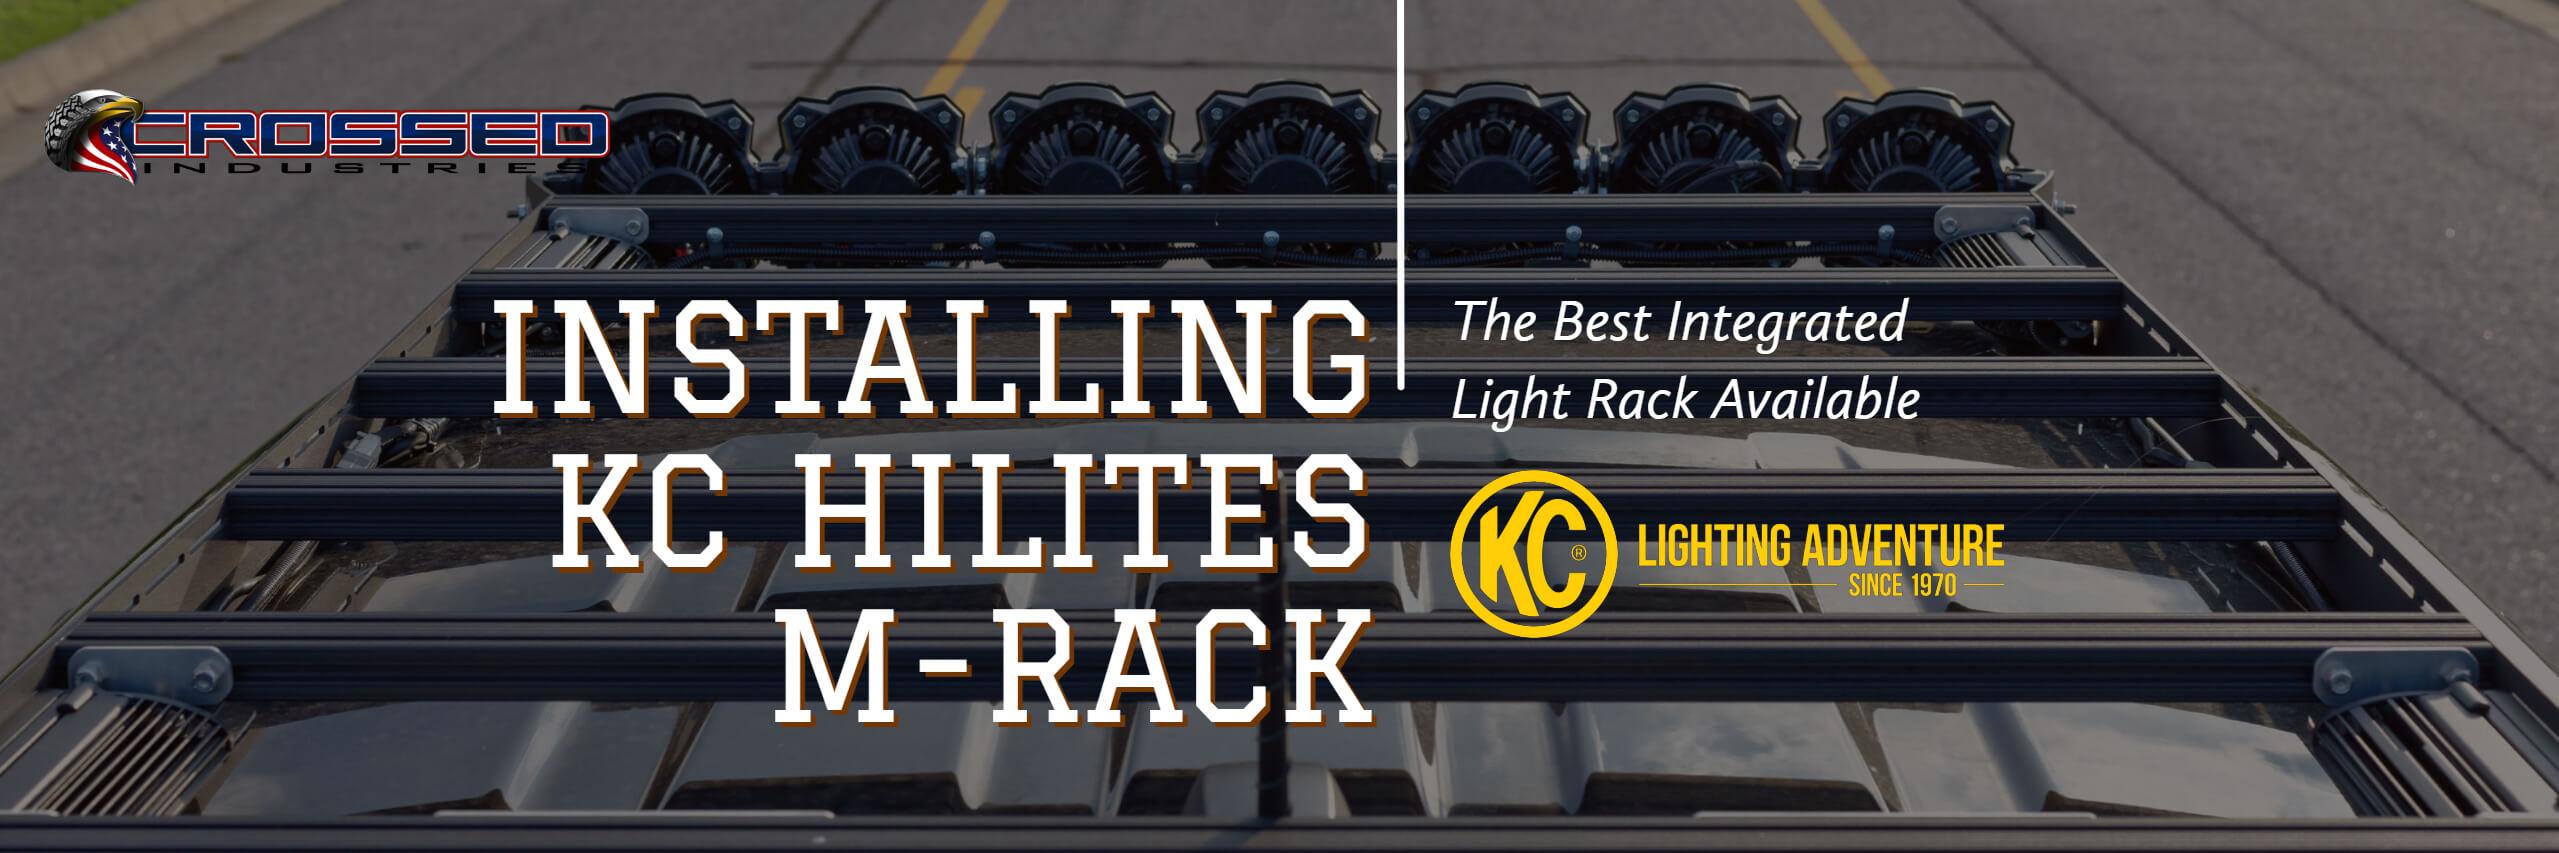 Mounting The KC HiLiTES M-Rack - M Rack Banner